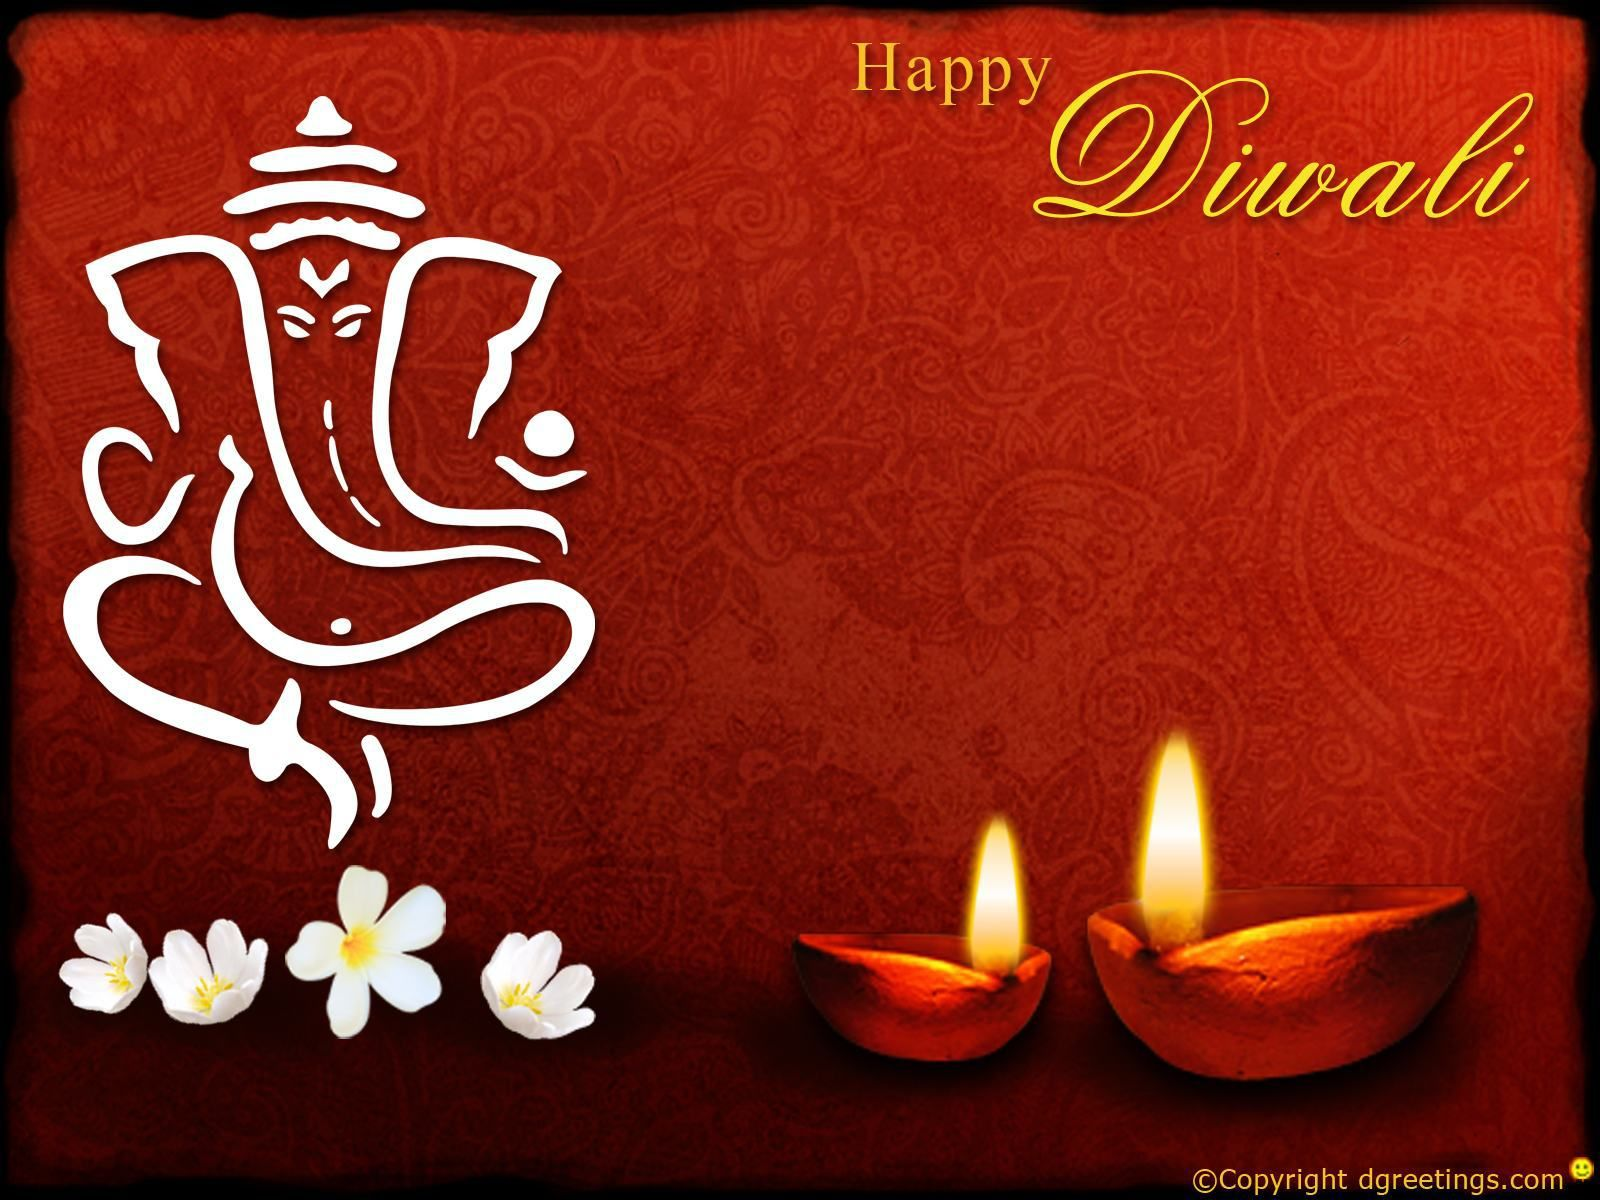 Simple Wallpaper High Quality Diwali - b9b1fc3f6a4a45a130c0720b69511d78  Perfect Image Reference_829736.jpg